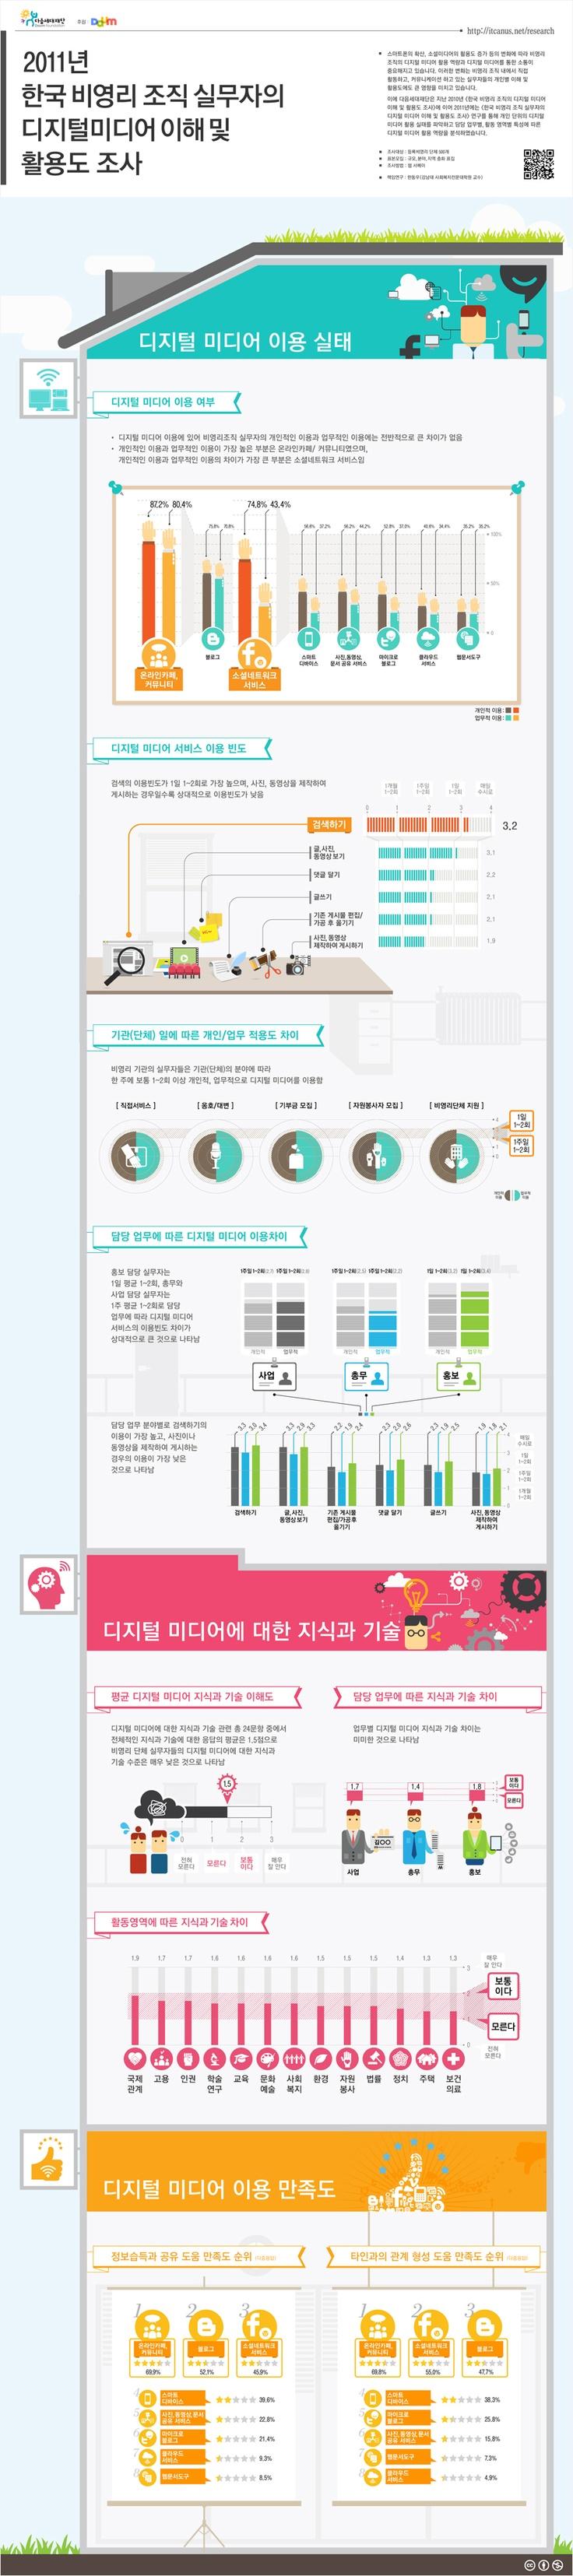 [Infographic] 2011 비영리 조직 실무자의 디지털 미디어 이용 및 활용도 조사에 관한 인포그래픽